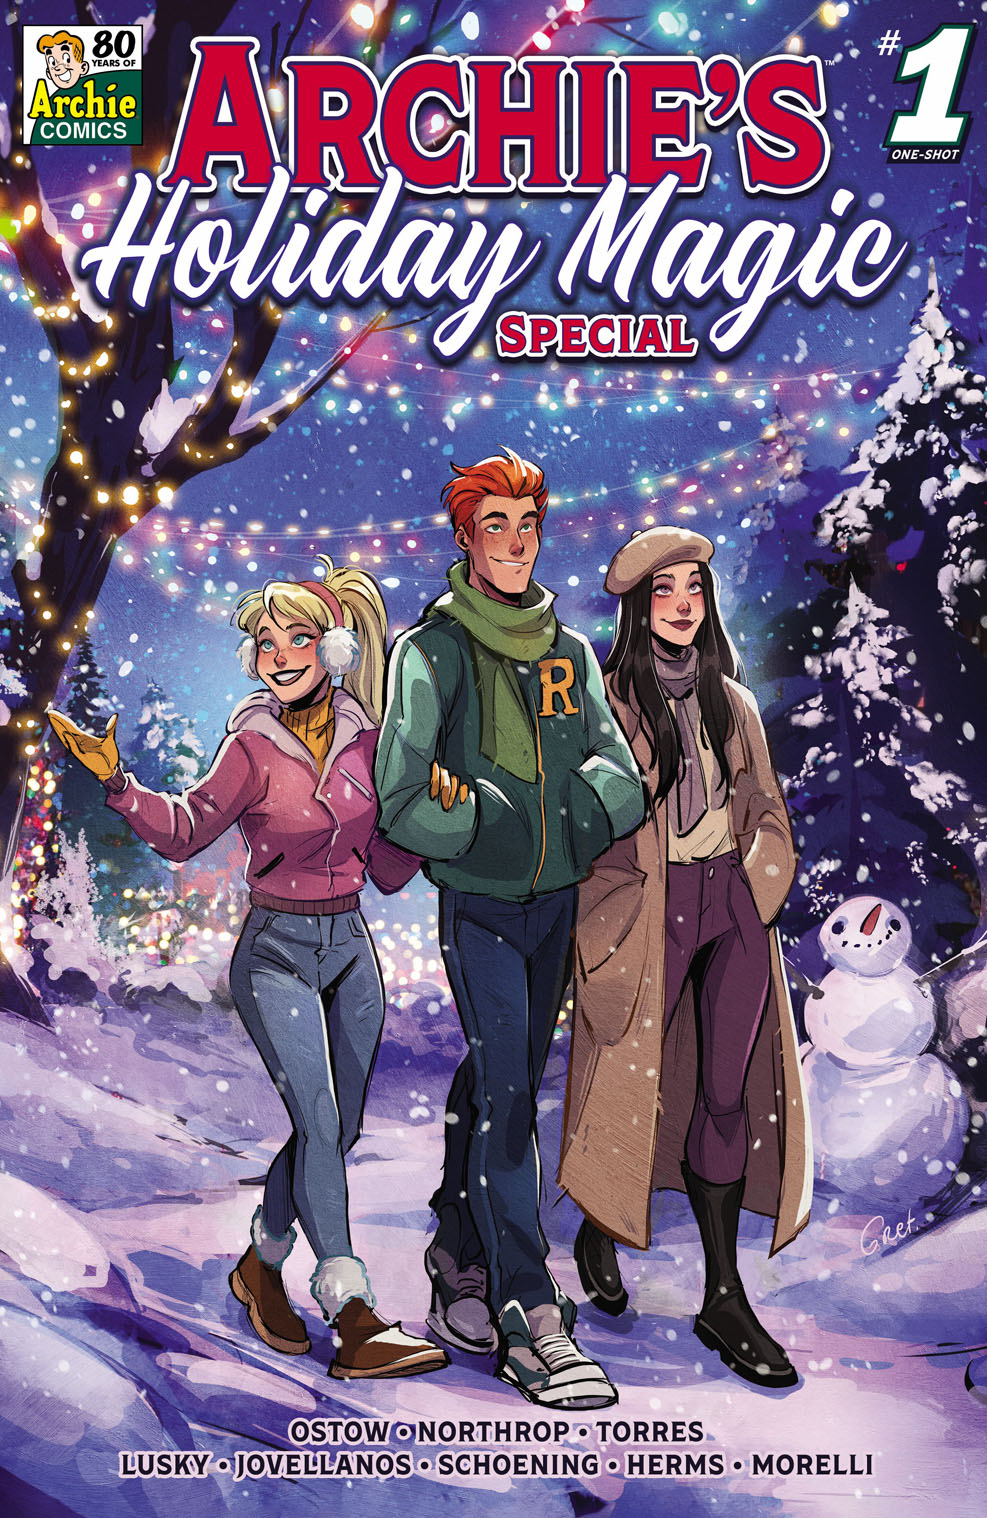 ArchiesHolidayMagicSpecial Archie Comic Publications December 2021 Solicitations